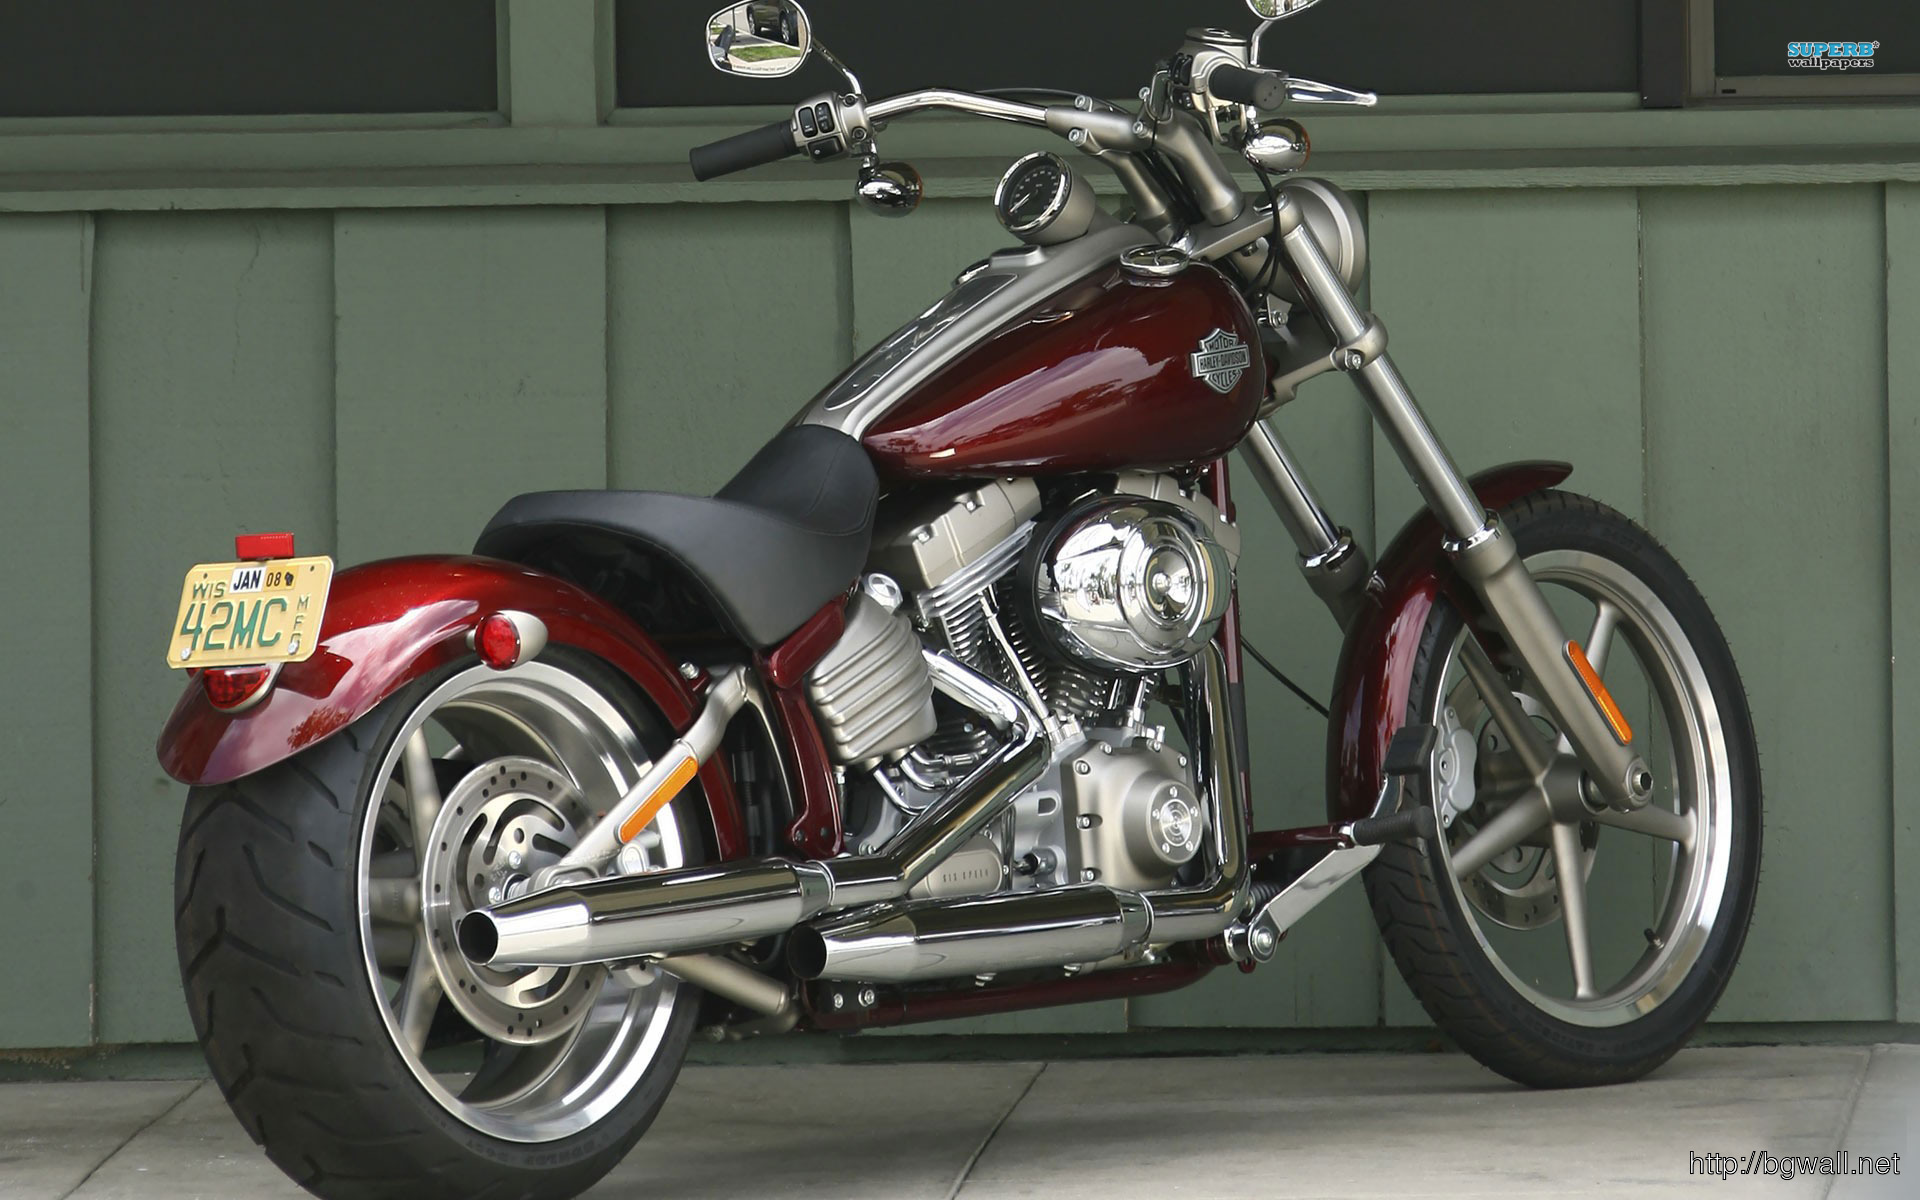 Harley Davidson Fxcwc Rocker C Wallpaper